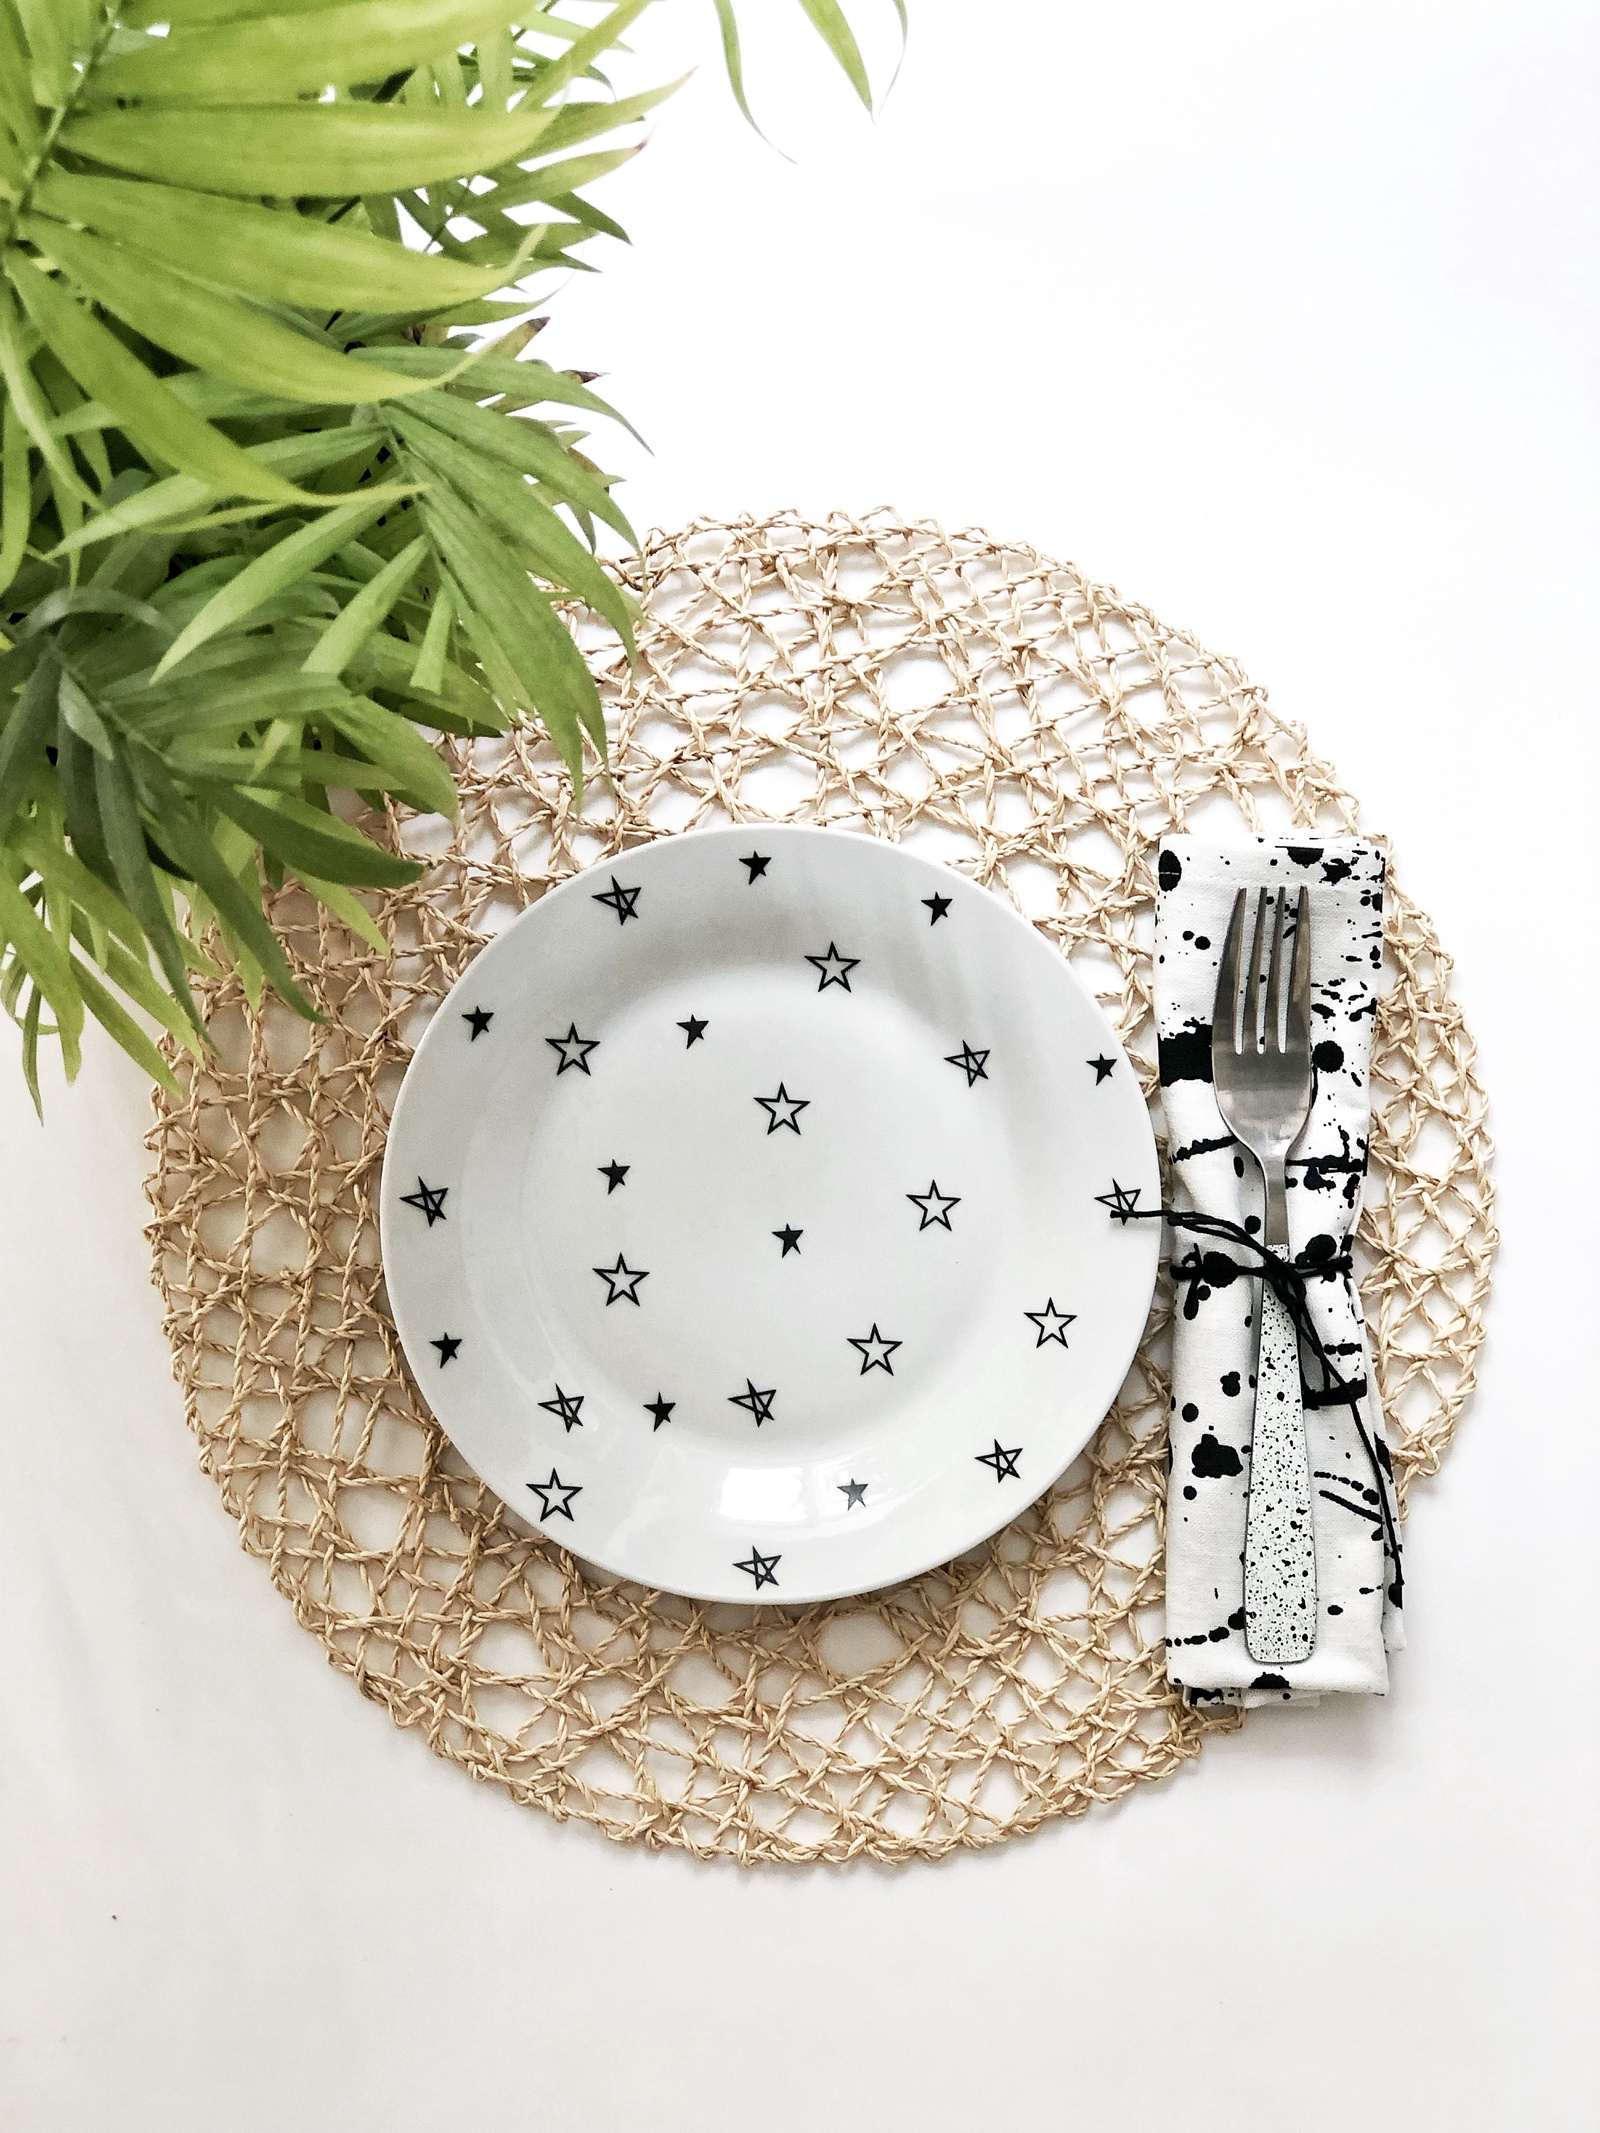 Тарелка Сотвори Чудо Звёзды 20 см, белый тарелка мелкая сотвори чудо бантик sans brides диаметр 20 см